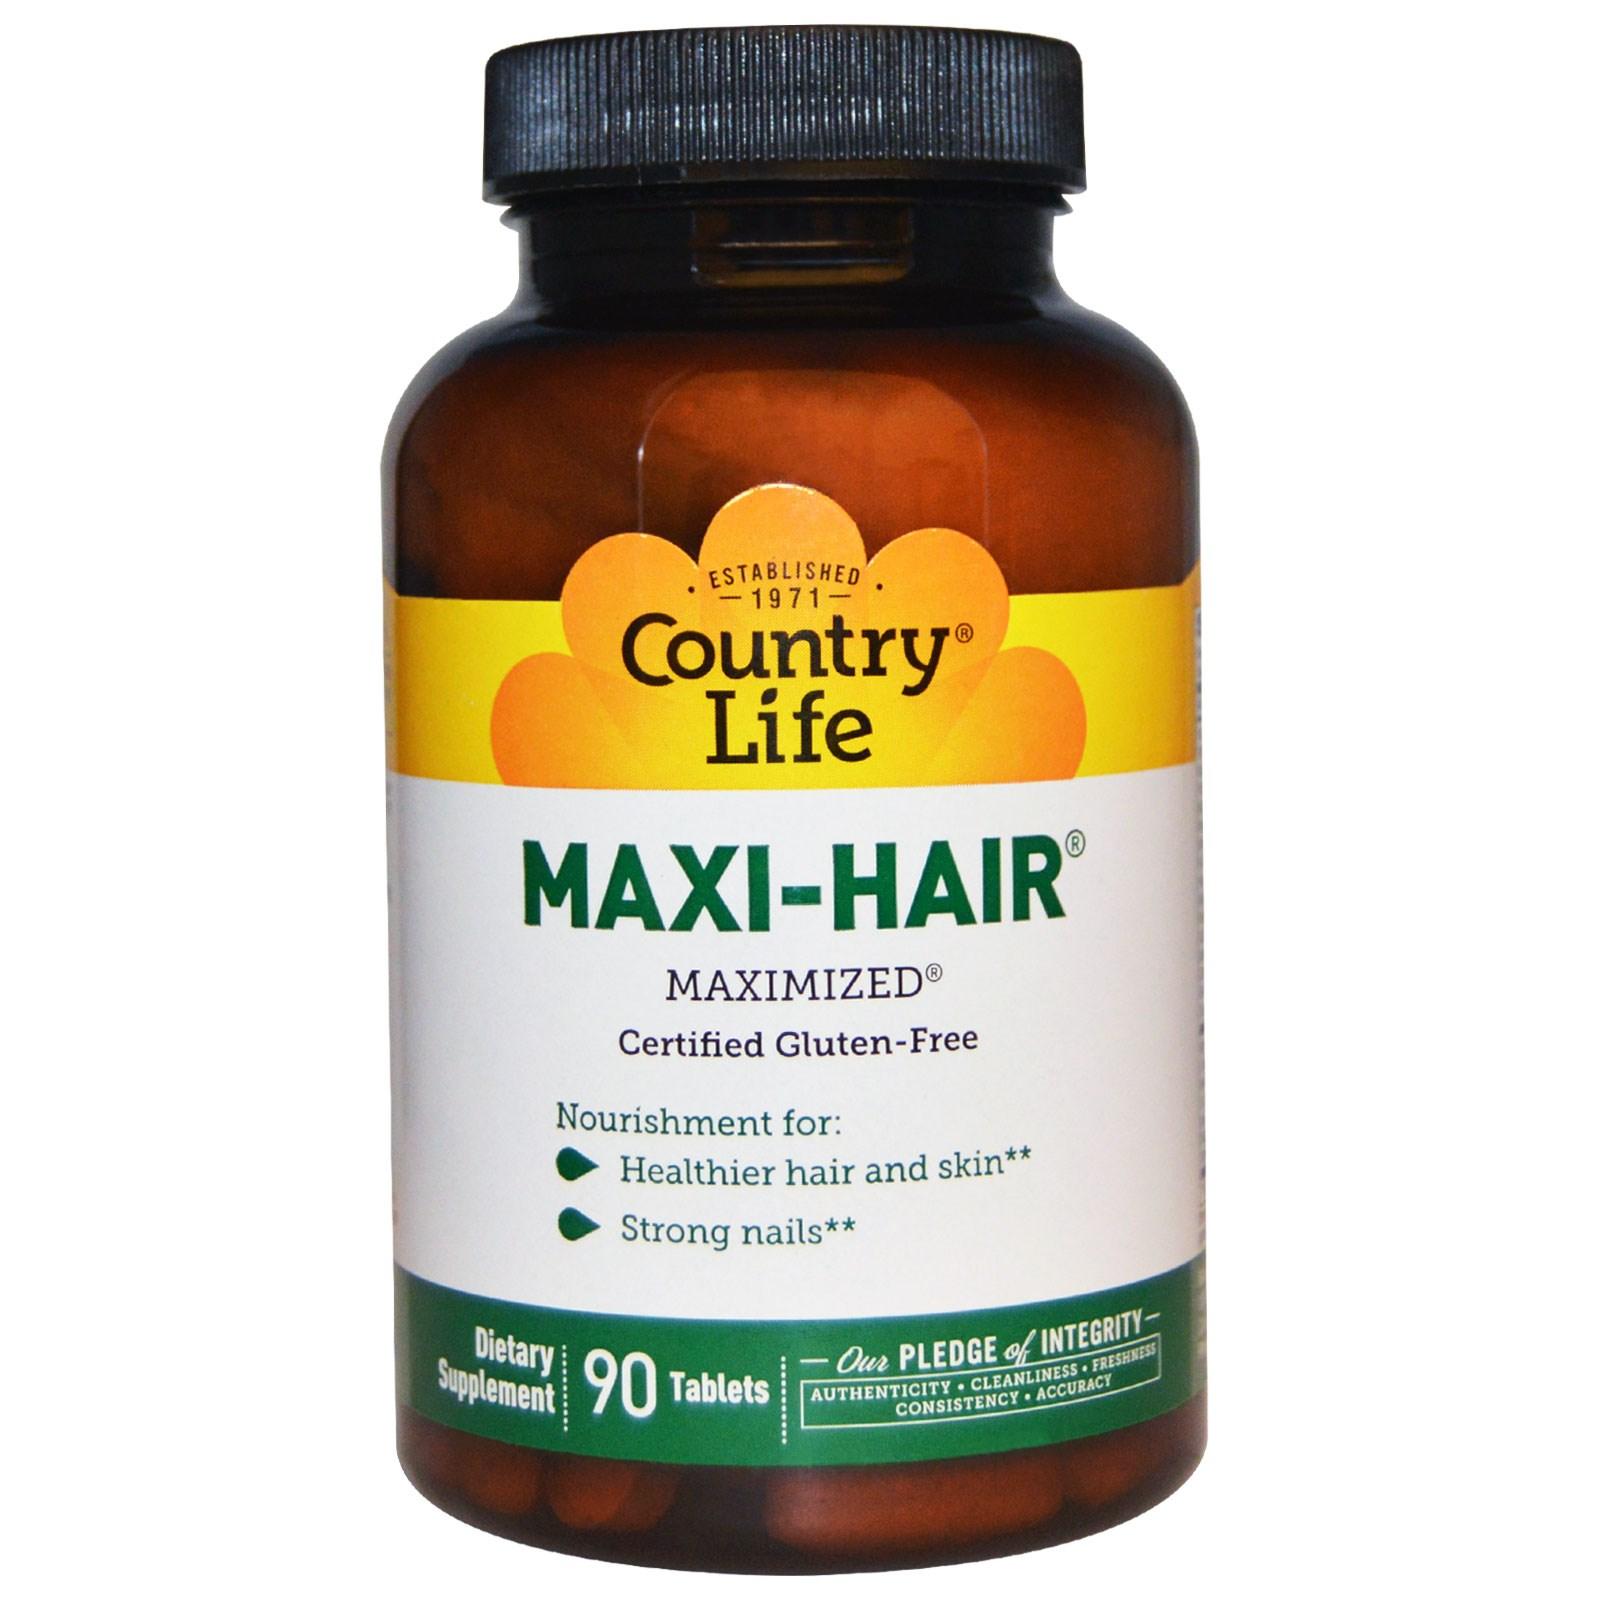 Country Life, Maxi-Hair